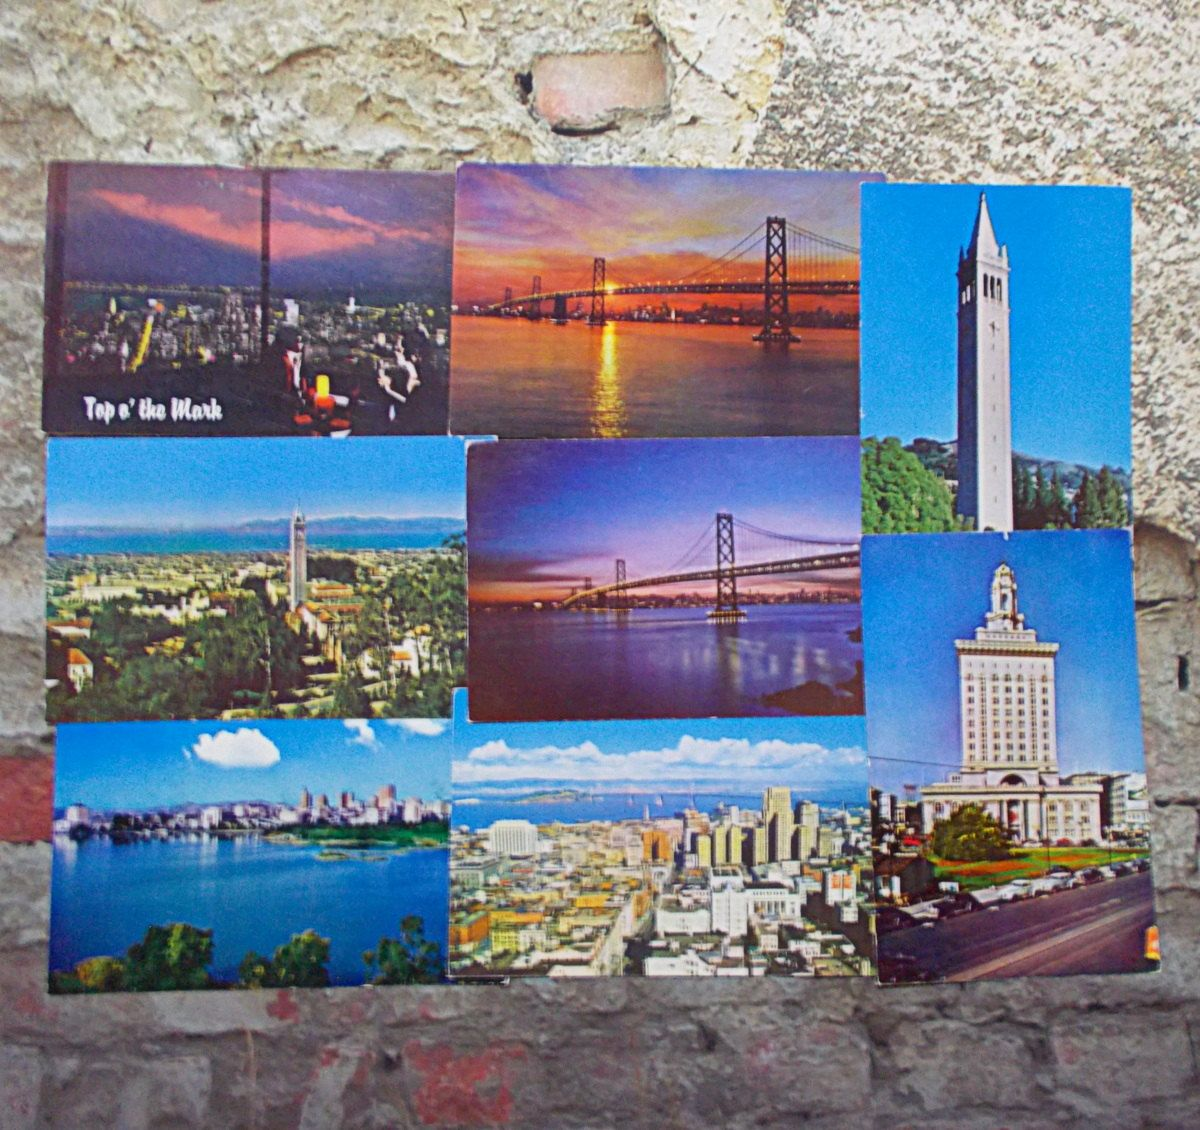 Vintage Postcard Lot California Landmarks San Francisco Oakland City Hall University Panoramic Unused by TntbrbefanDolls on Etsy #postcards #vintage #california #souvenirs